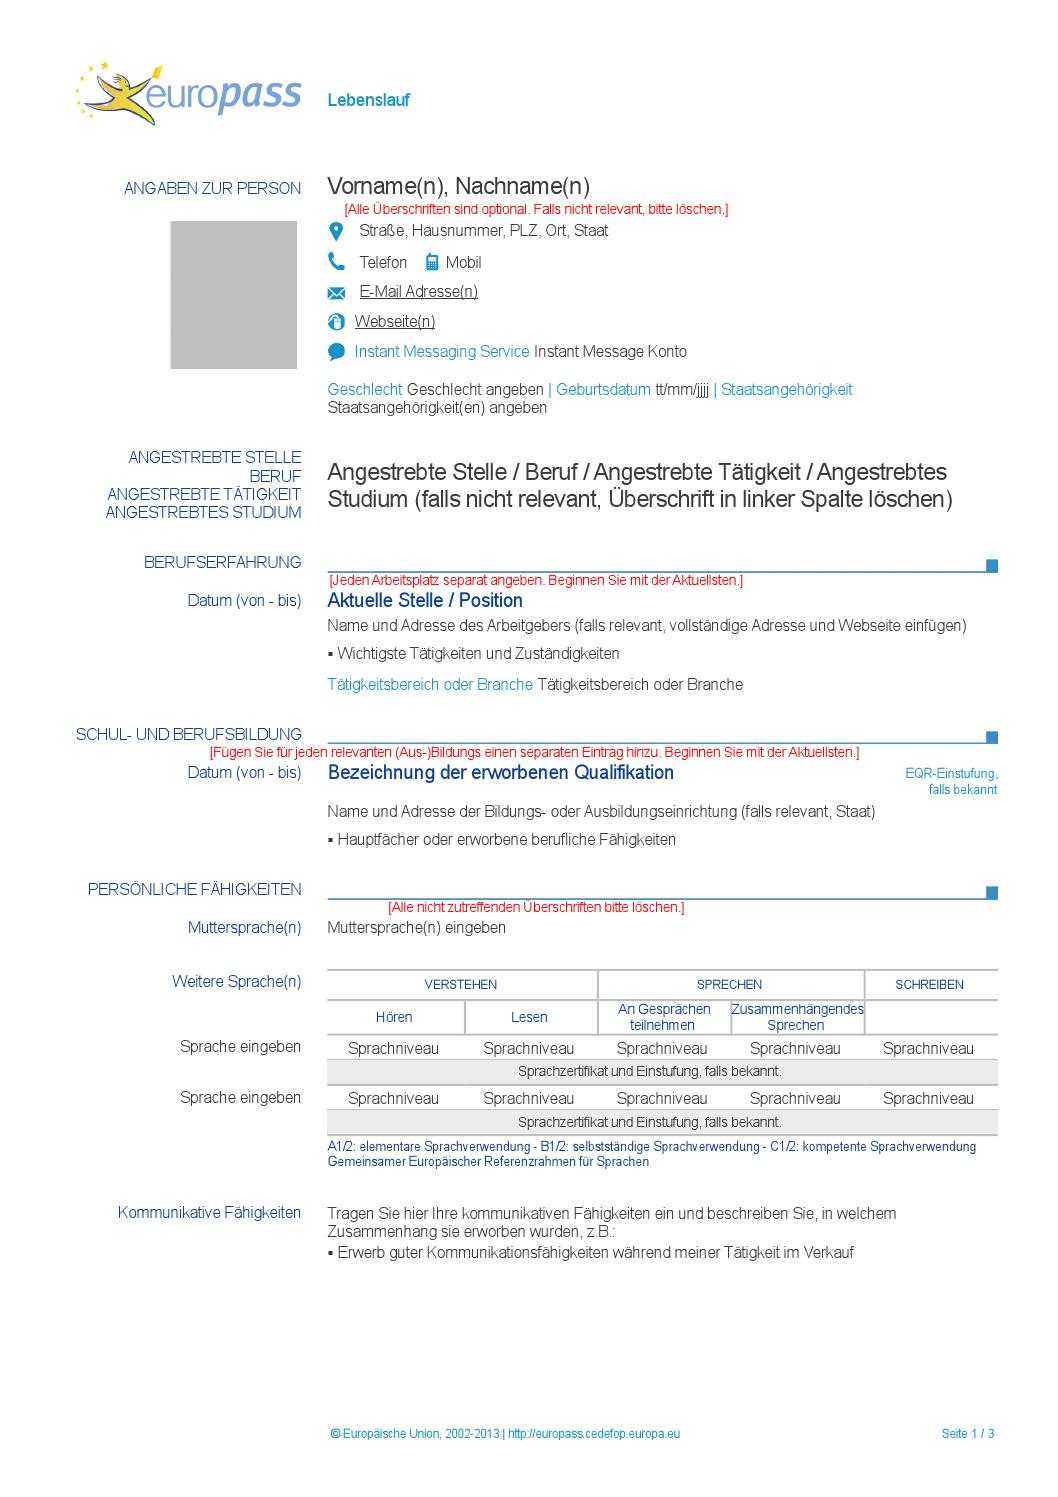 europass cv by sran bai issuu - Sprachniveau Lebenslauf